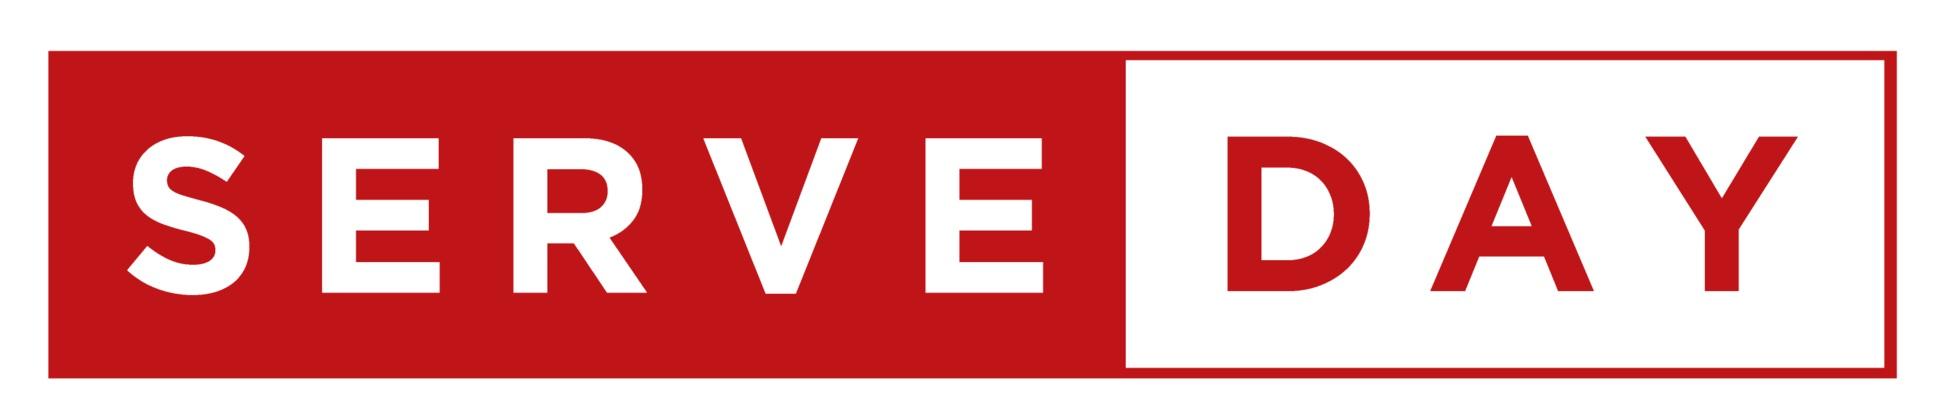 serve-day-logo.jpg